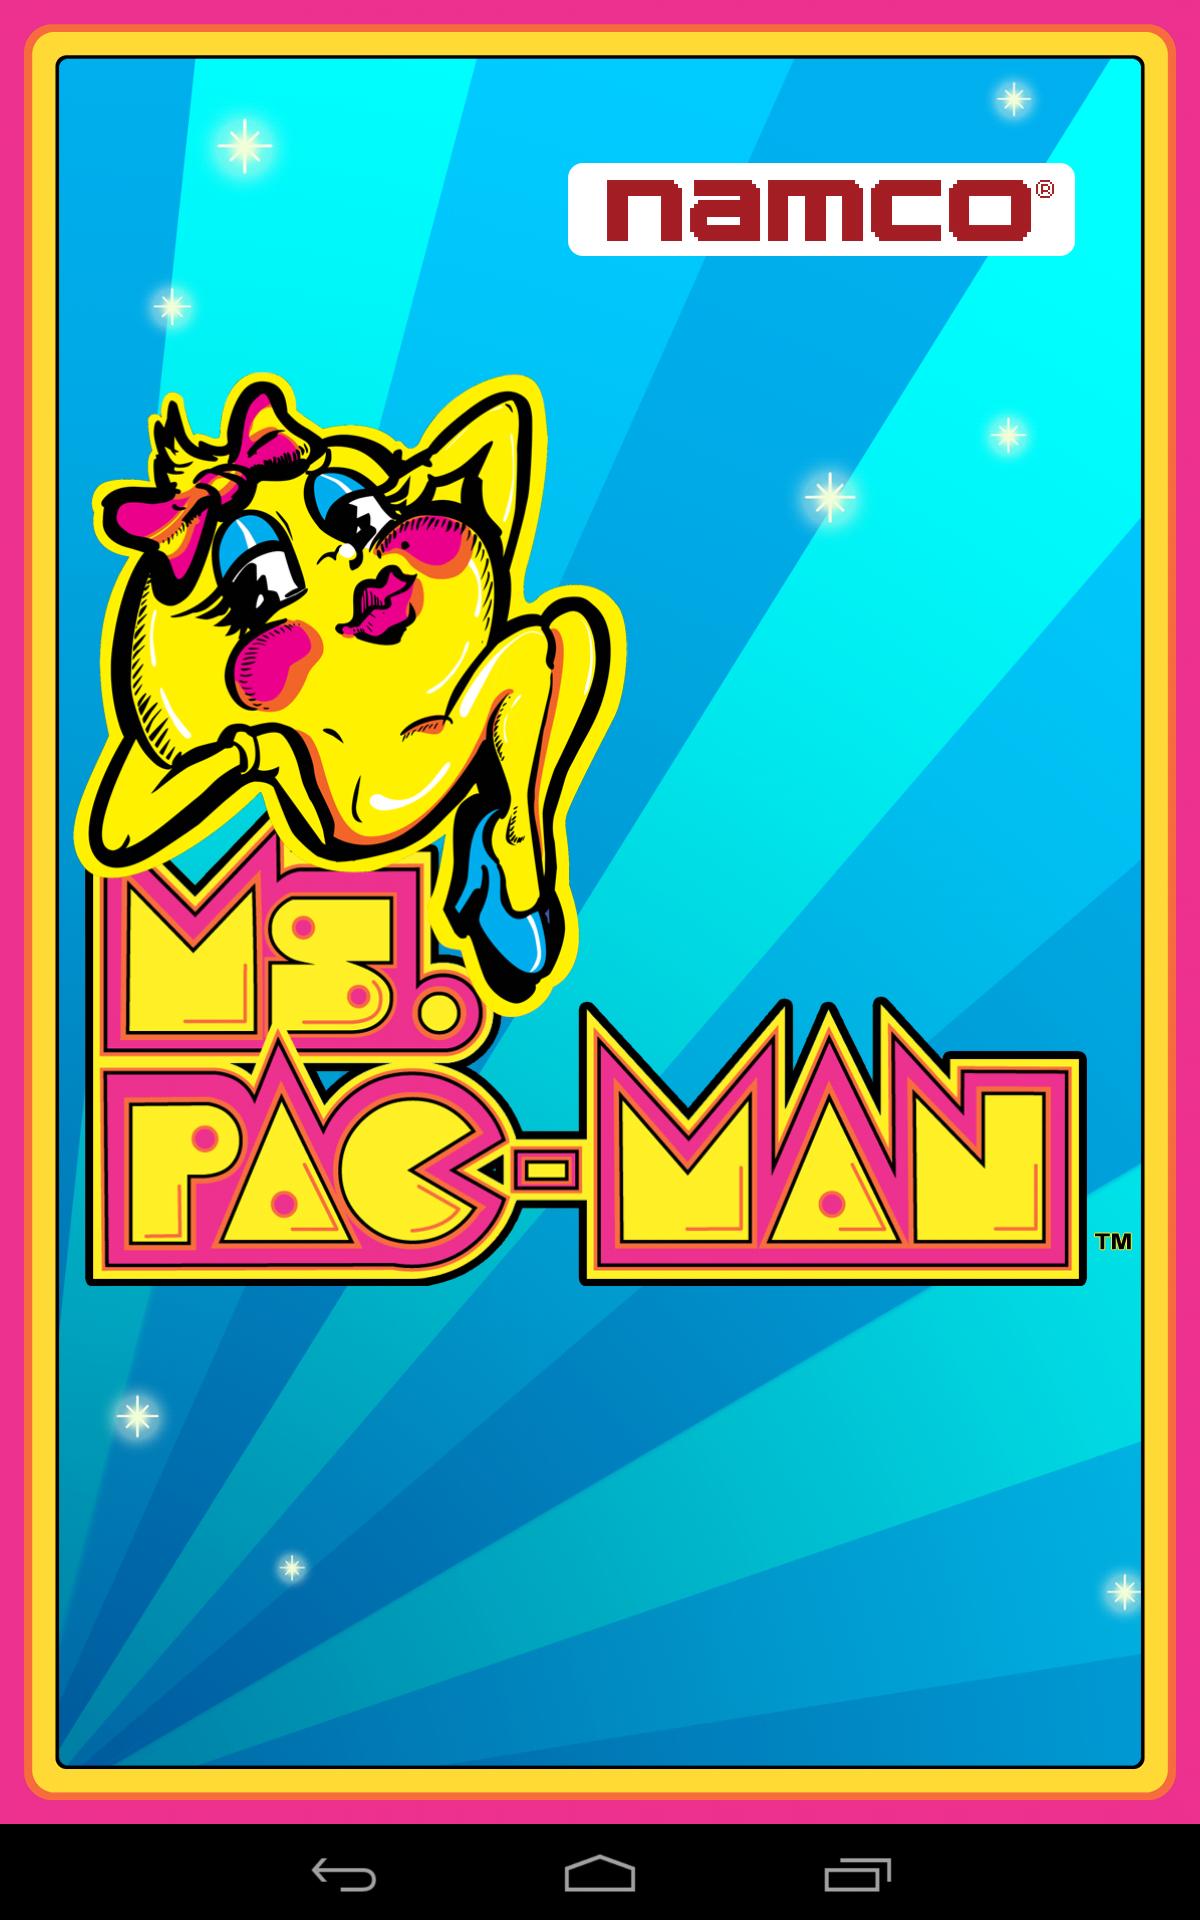 Ms. PAC-MAN by Namco screenshot #1